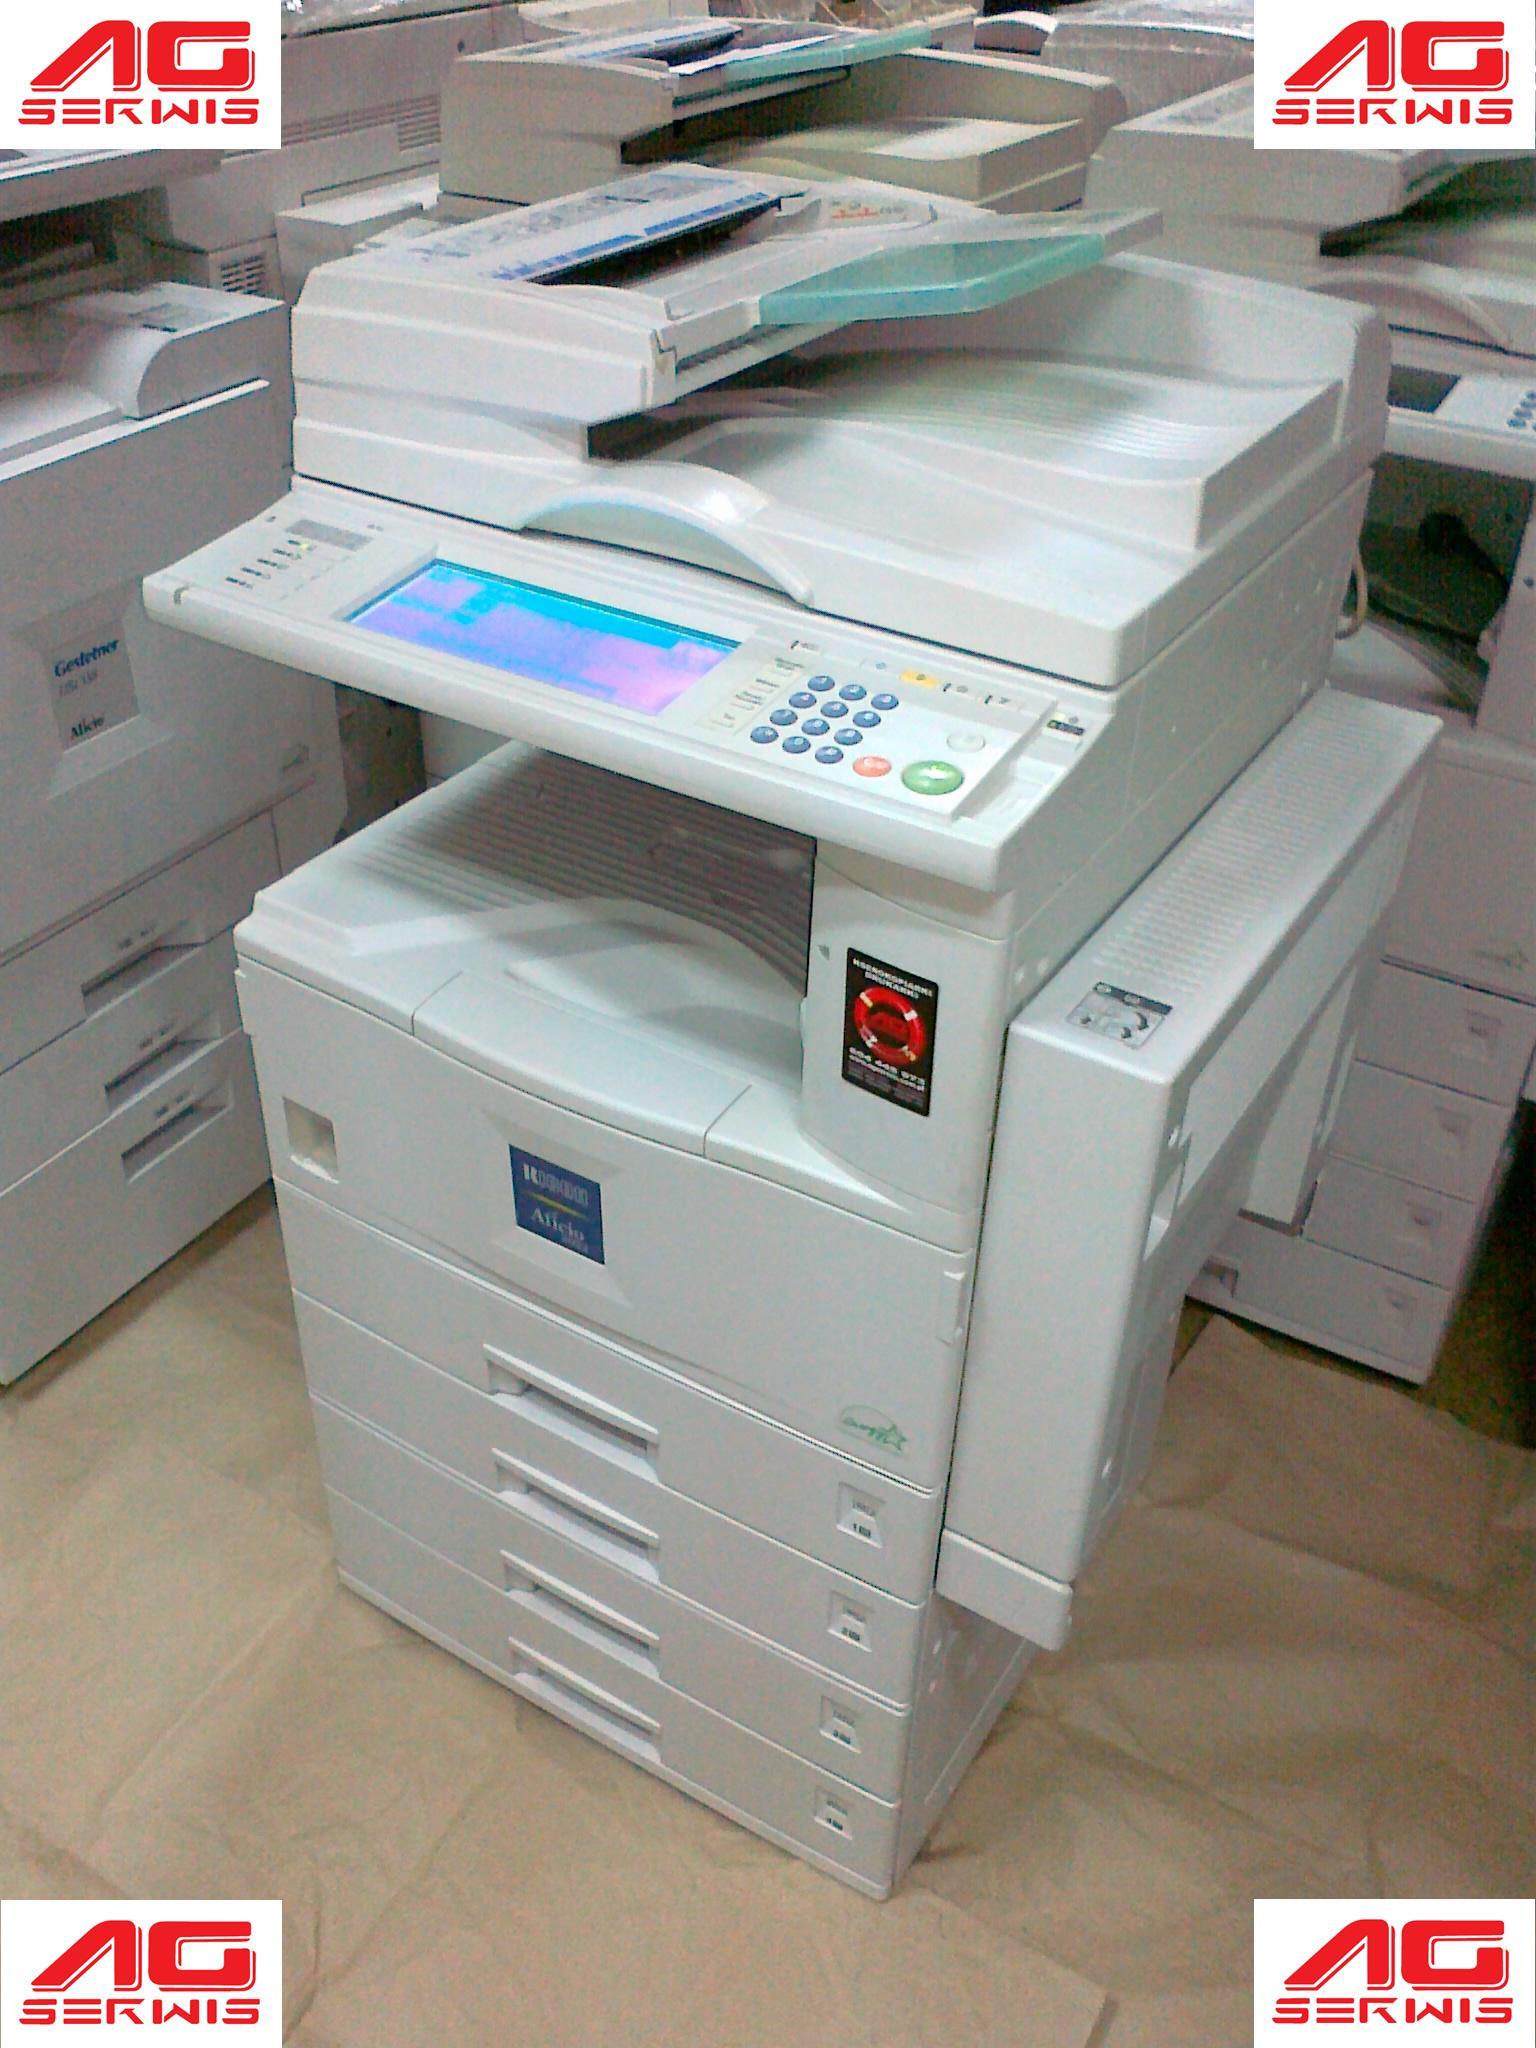 drukarka skaner kserokopiarka faks